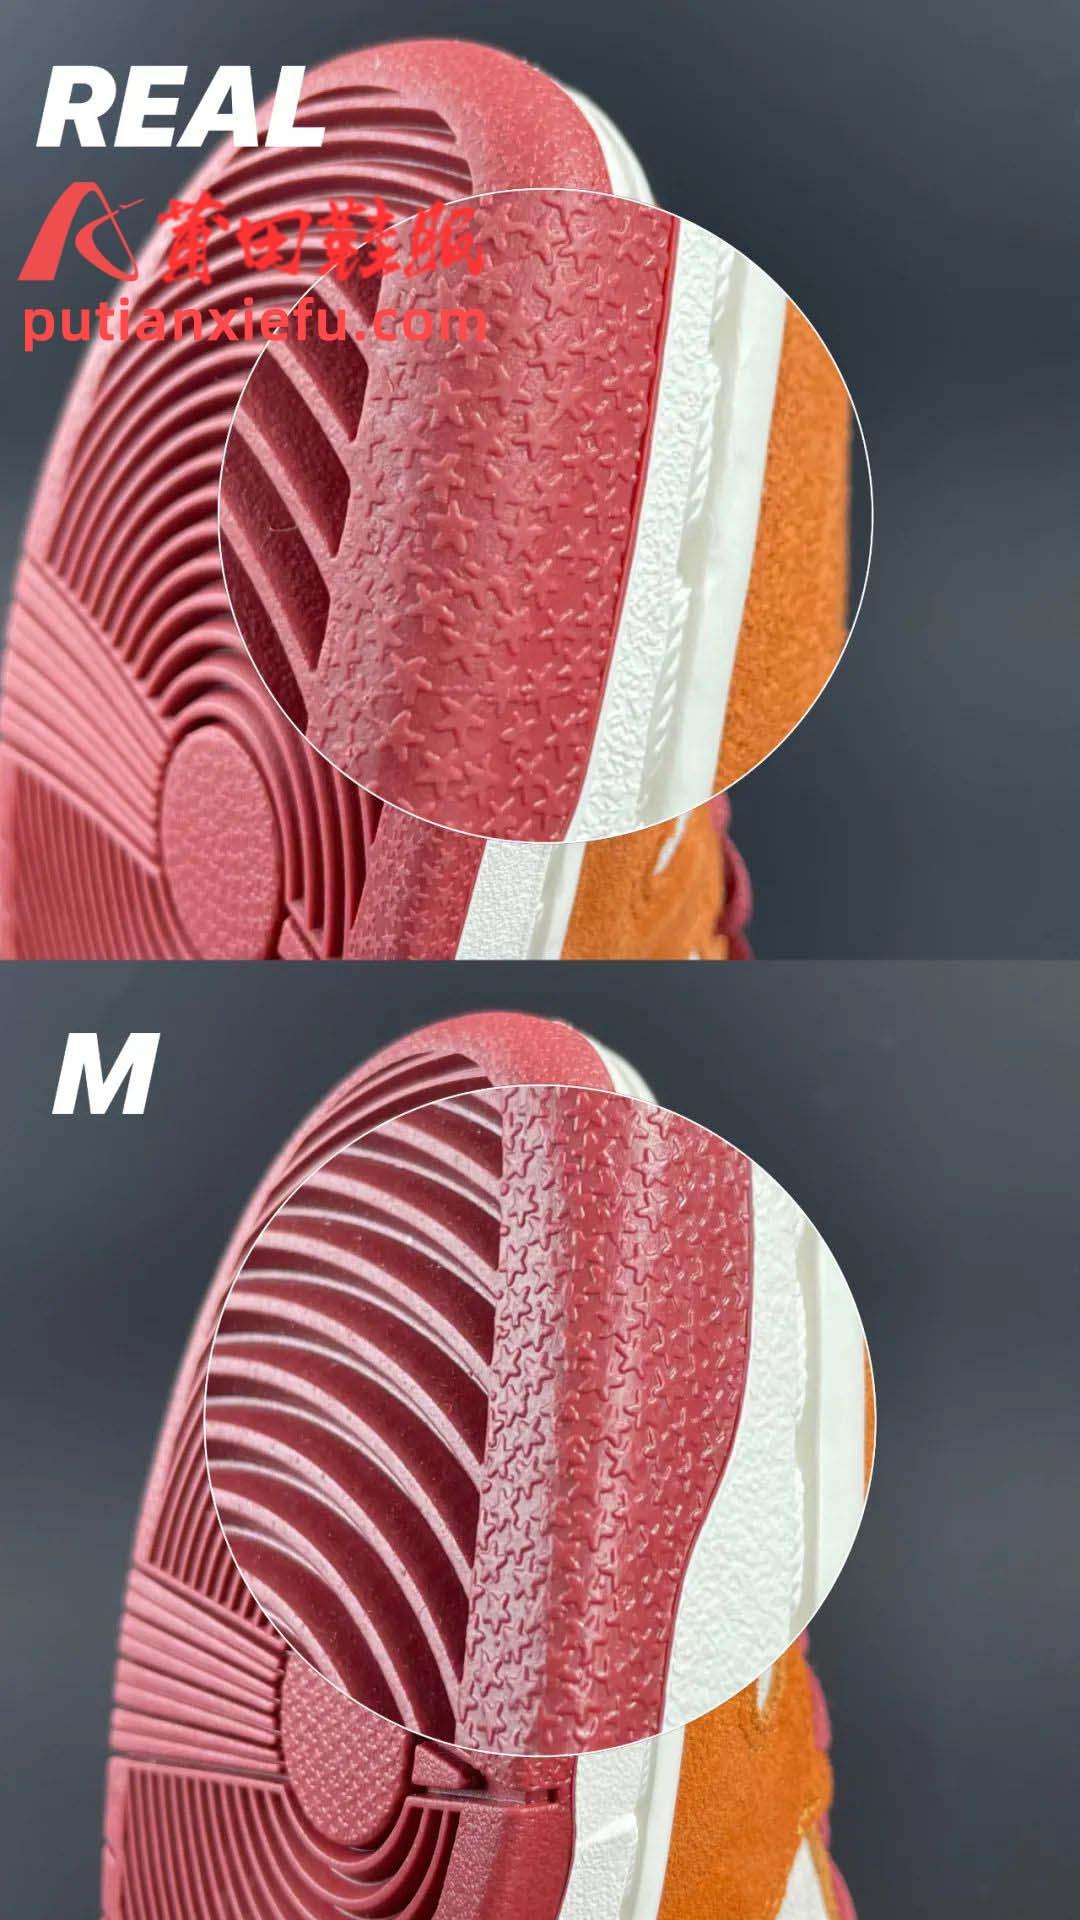 Nike SB Dunk Russet Cedar 棕色红钩 真假对比